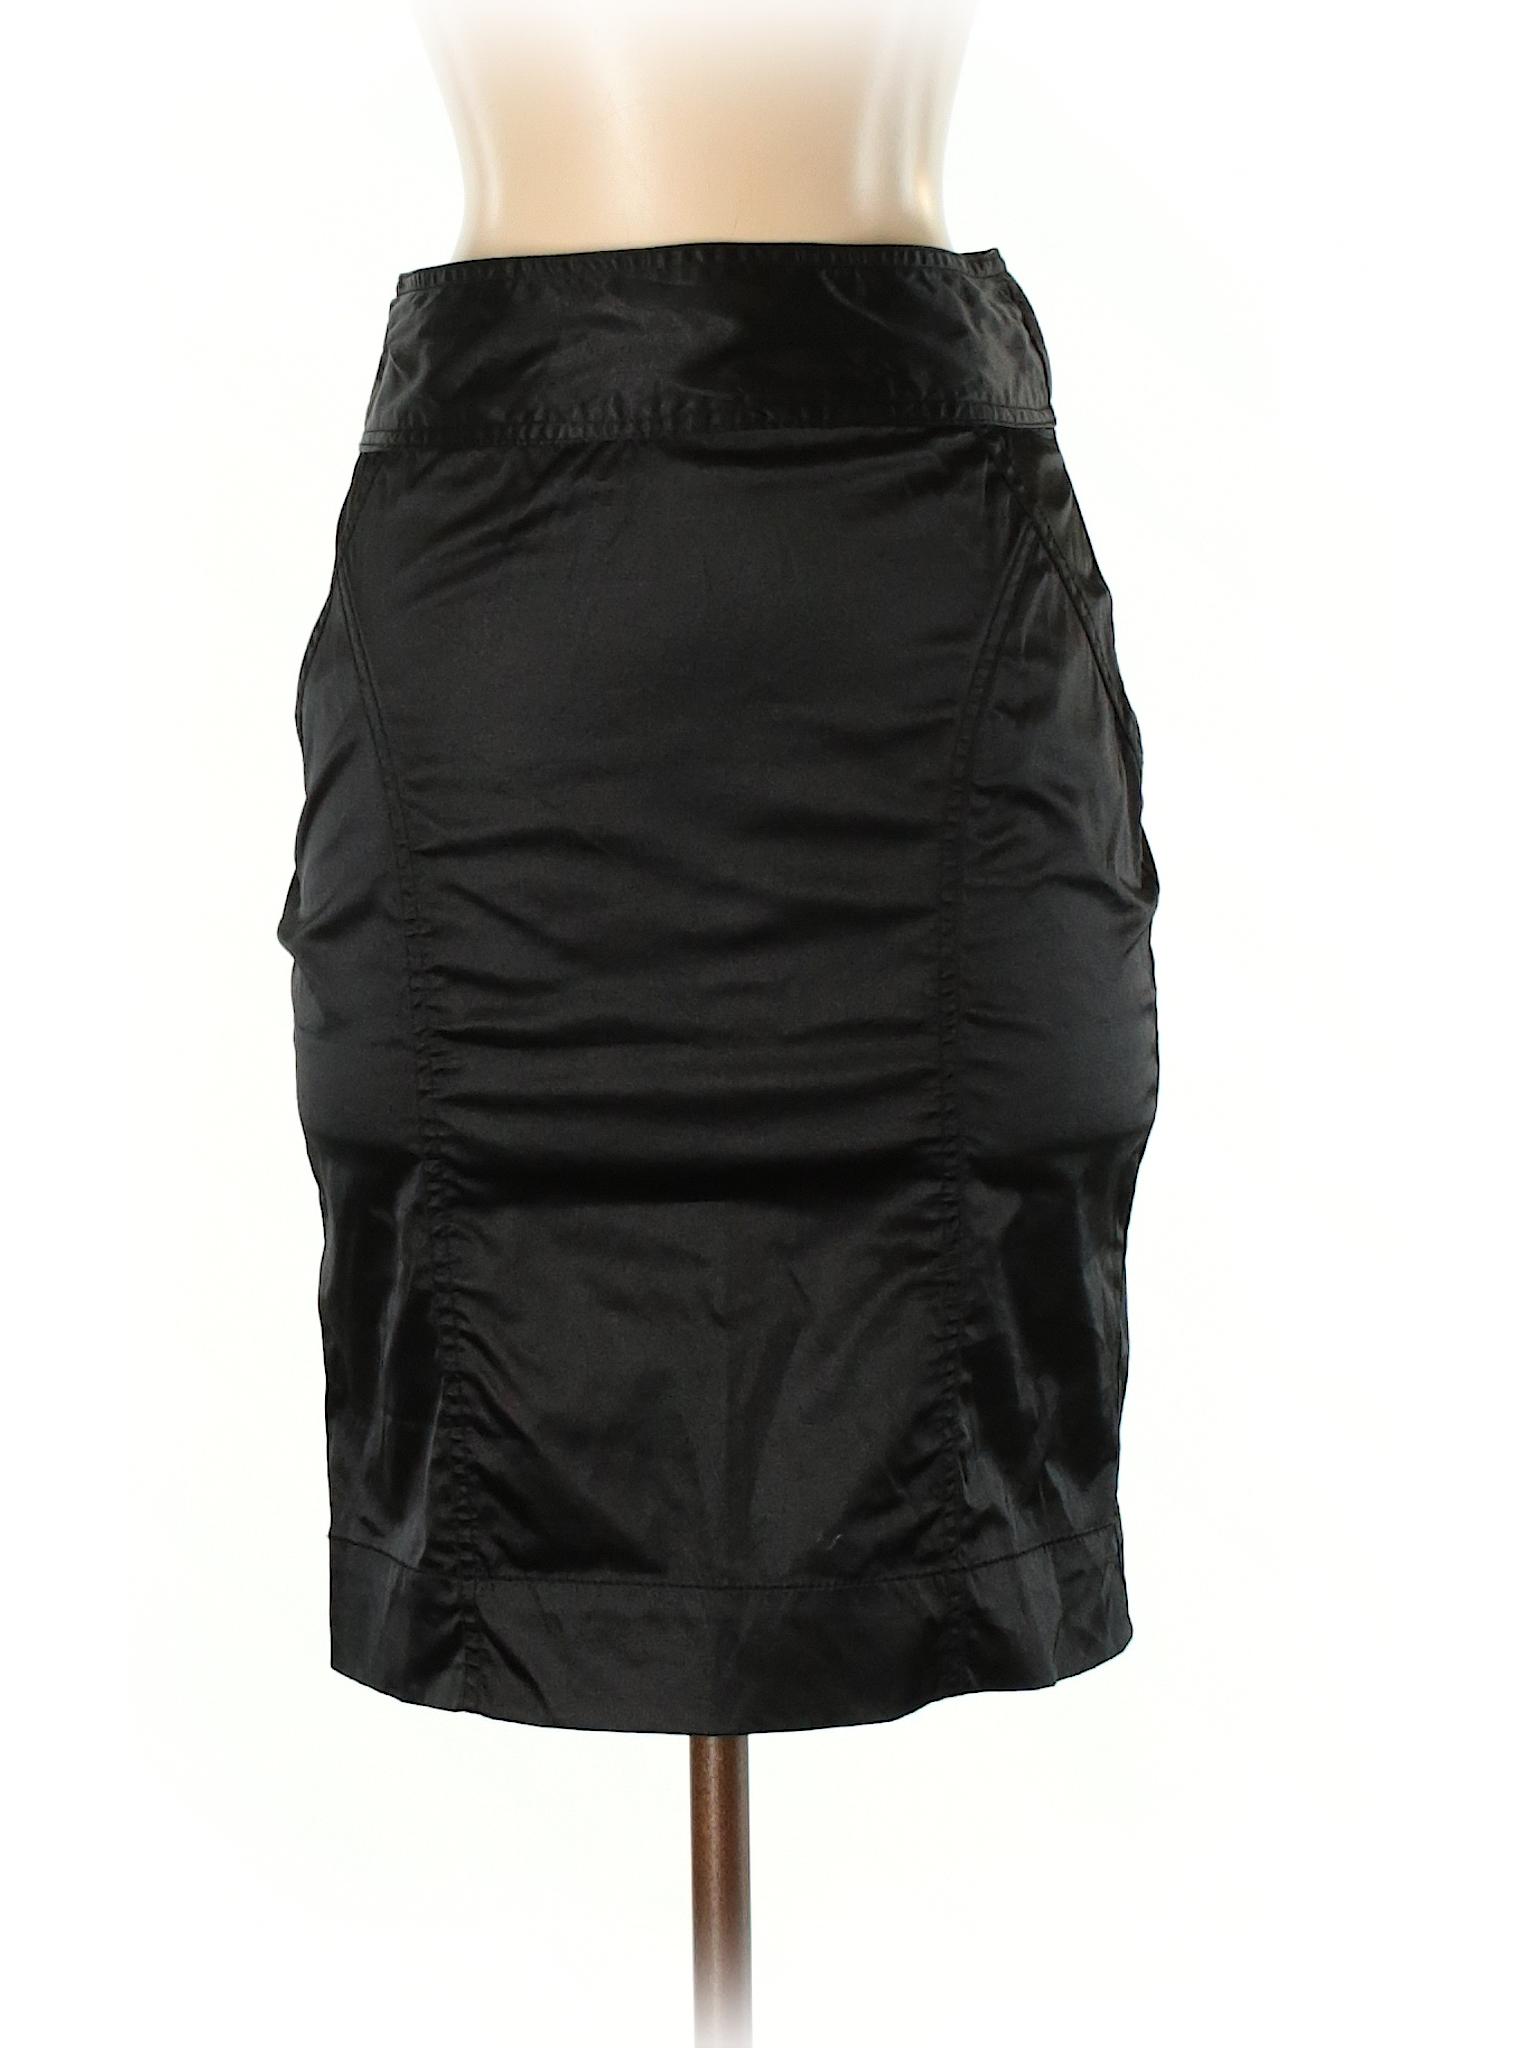 Boutique Casual Casual Skirt Skirt Boutique Boutique raTWqwrF